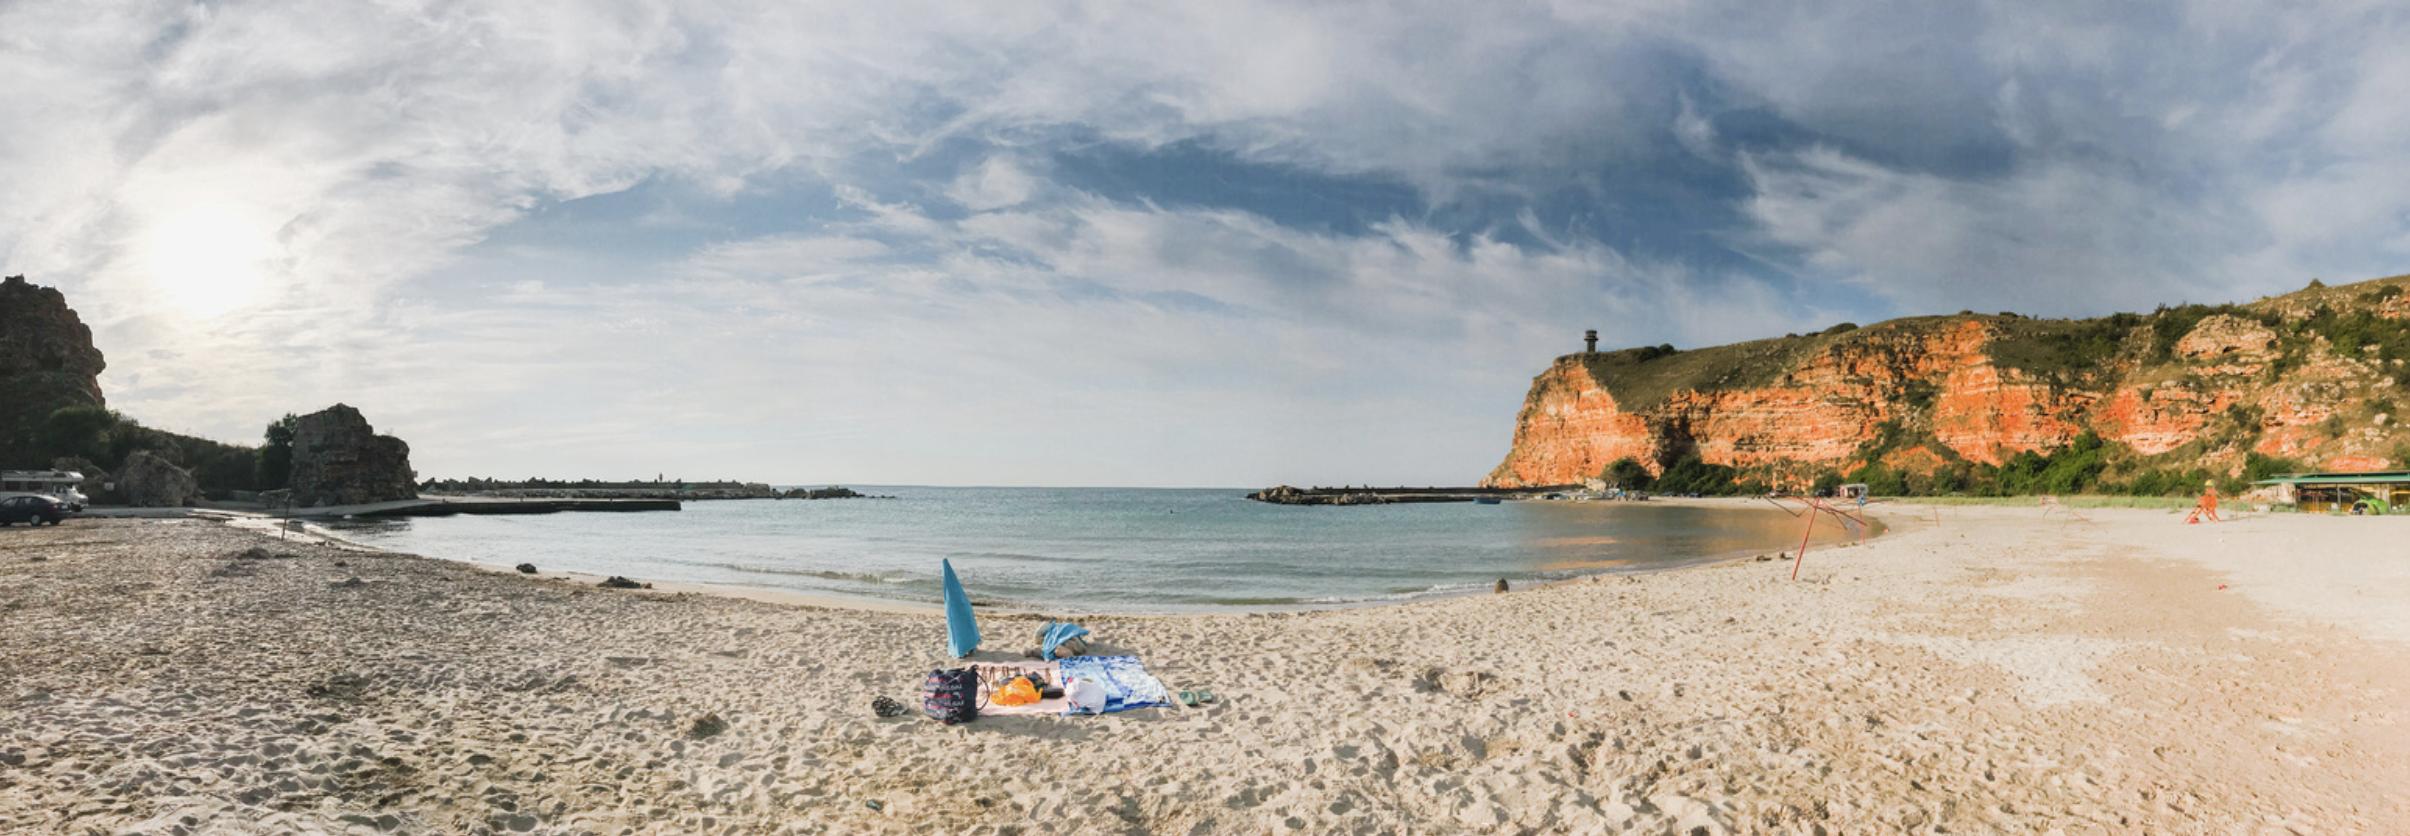 meer-strand-bulgarien-bucht